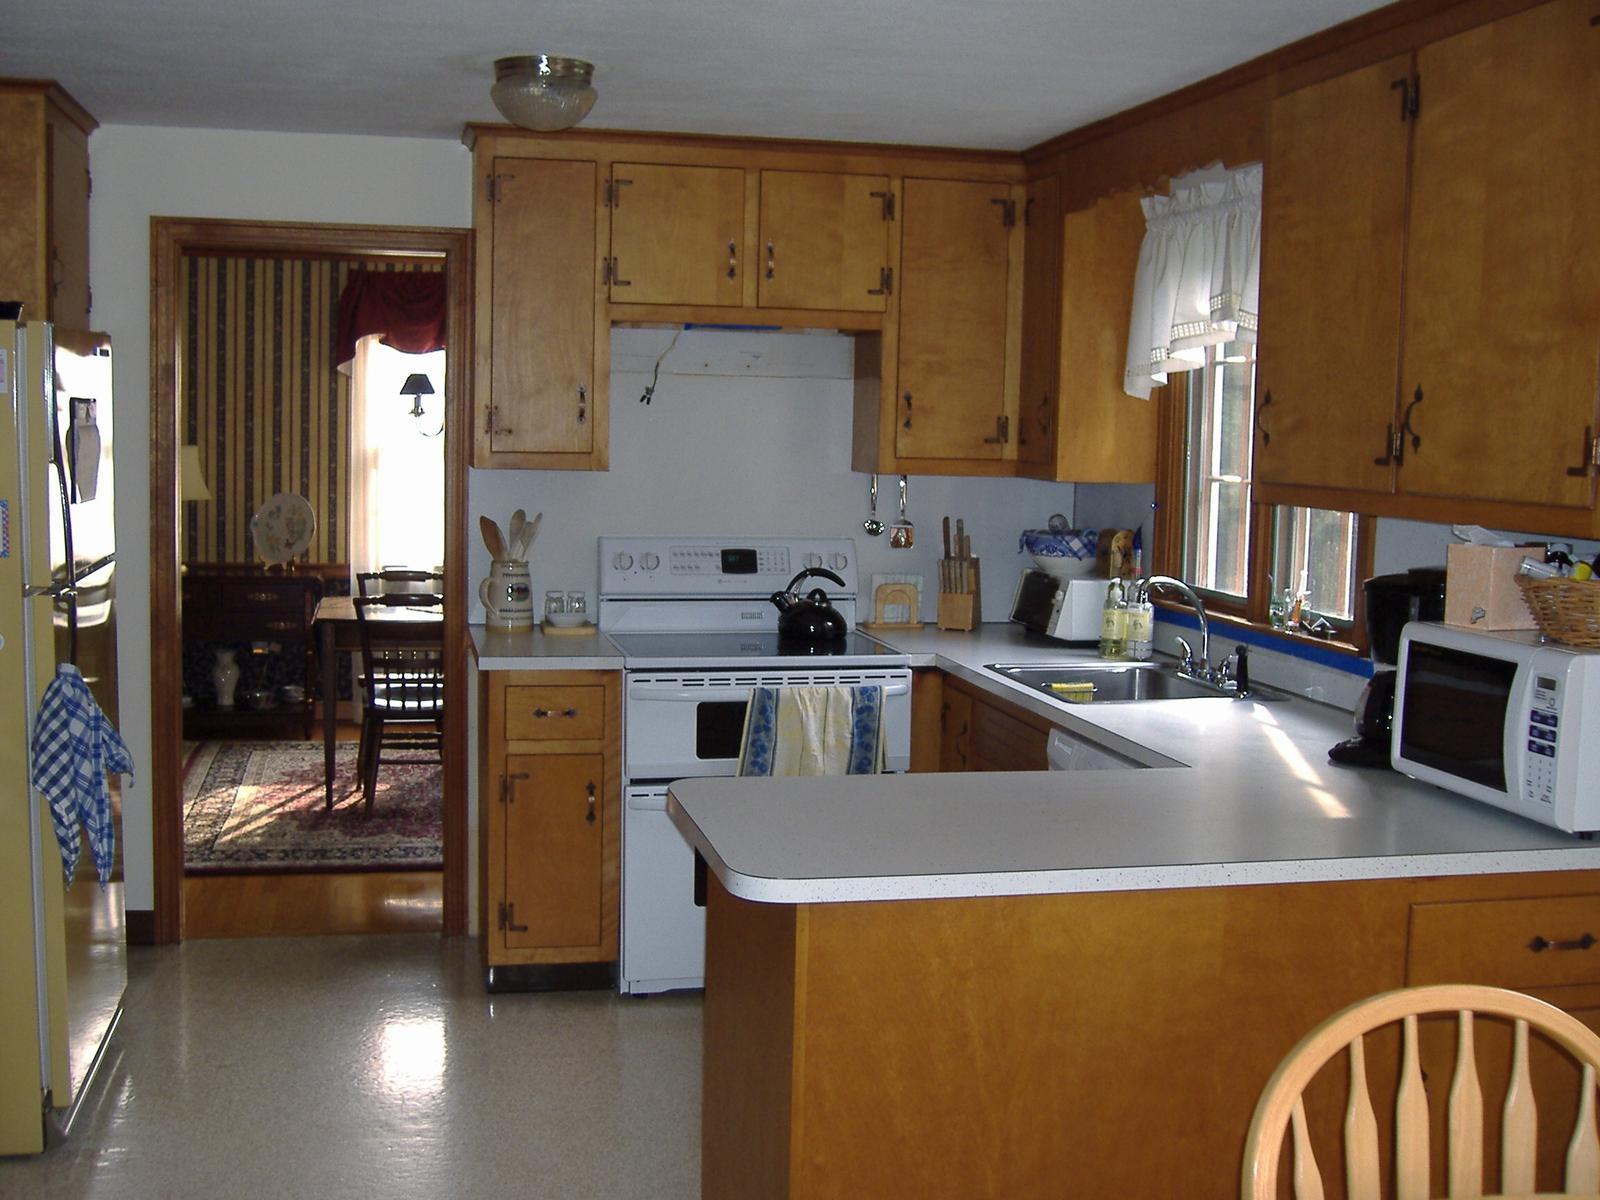 small kitchen remodel ideas photo - 2